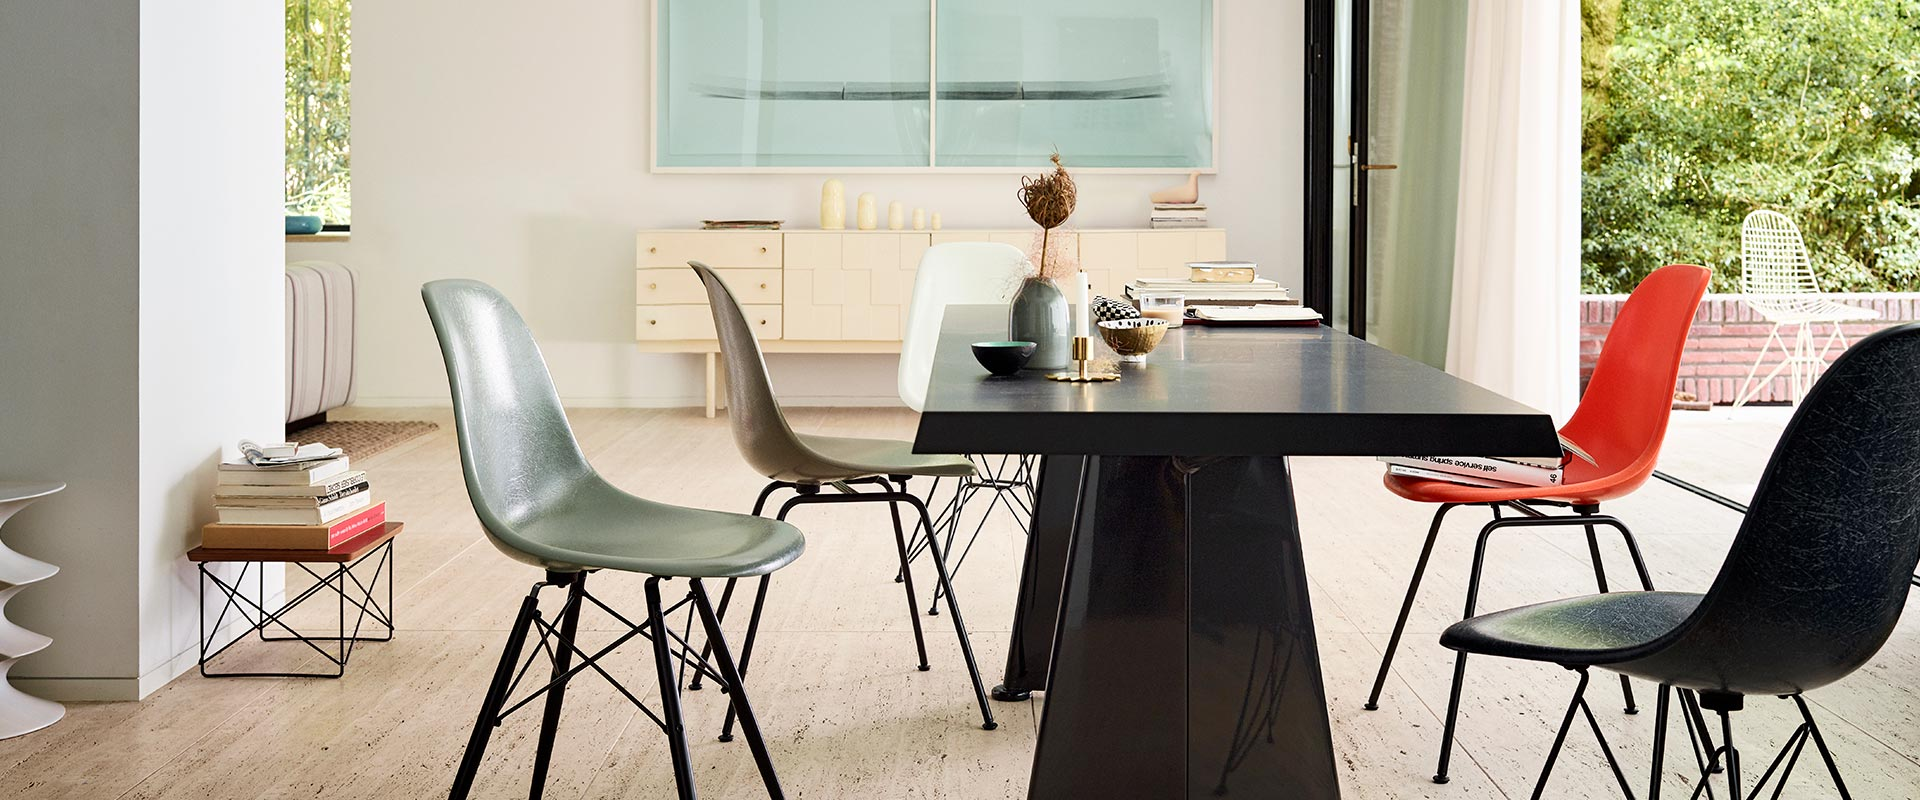 Diningroom Vitra Eames Fiberglass Chairs